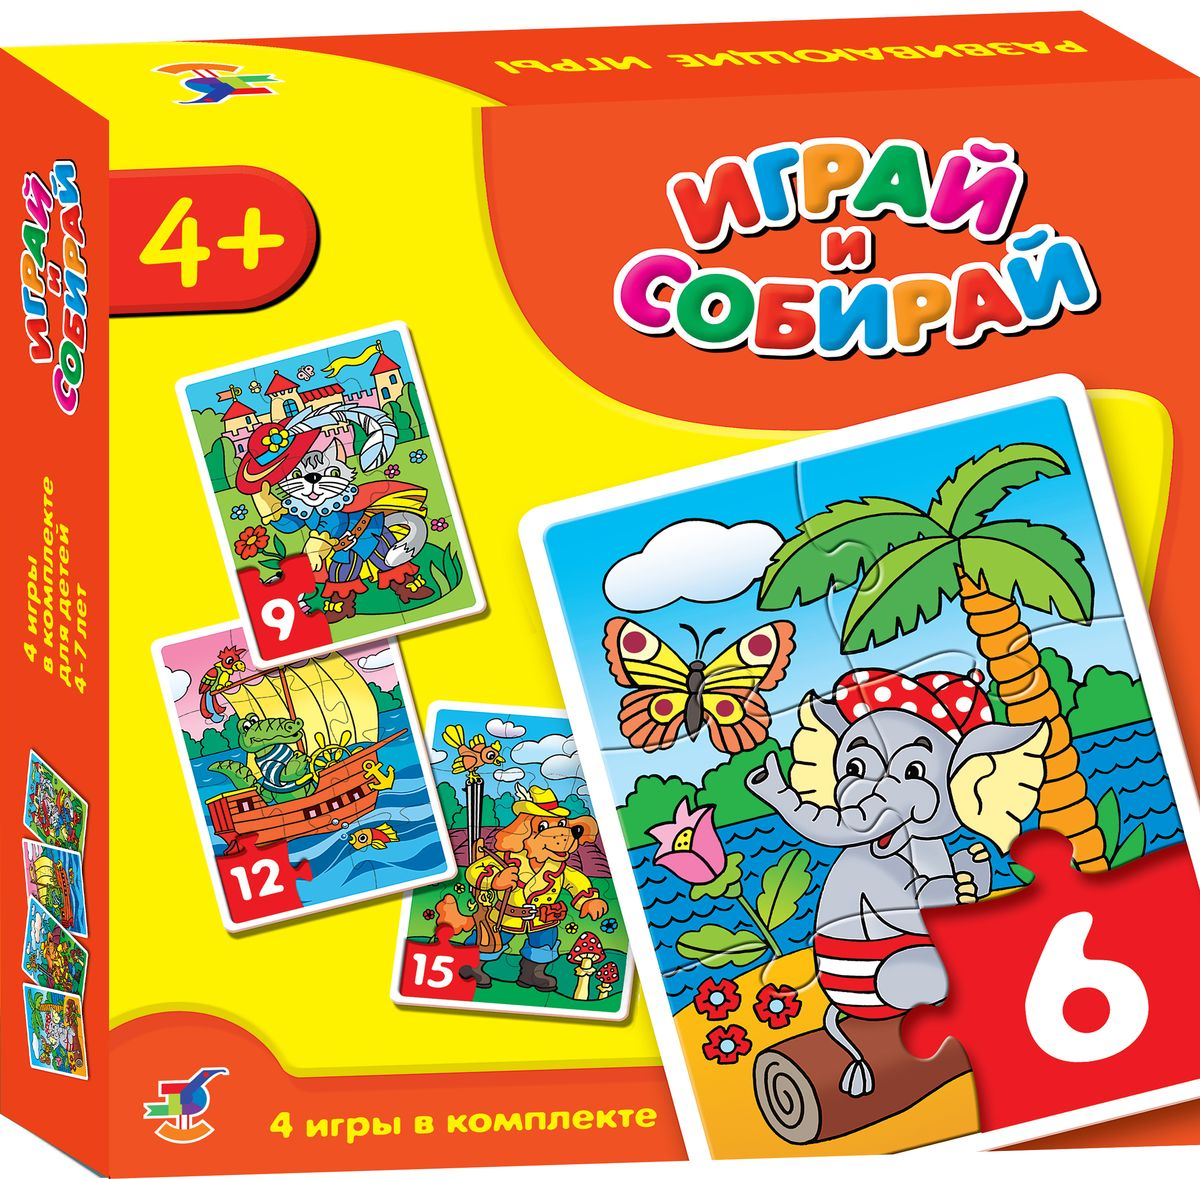 Дрофа-Медиа Пазл для малышей Играй и собирай 4 в 1 2940 дрофа медиа пазл для малышей играй и собирай 4 в 1 2947